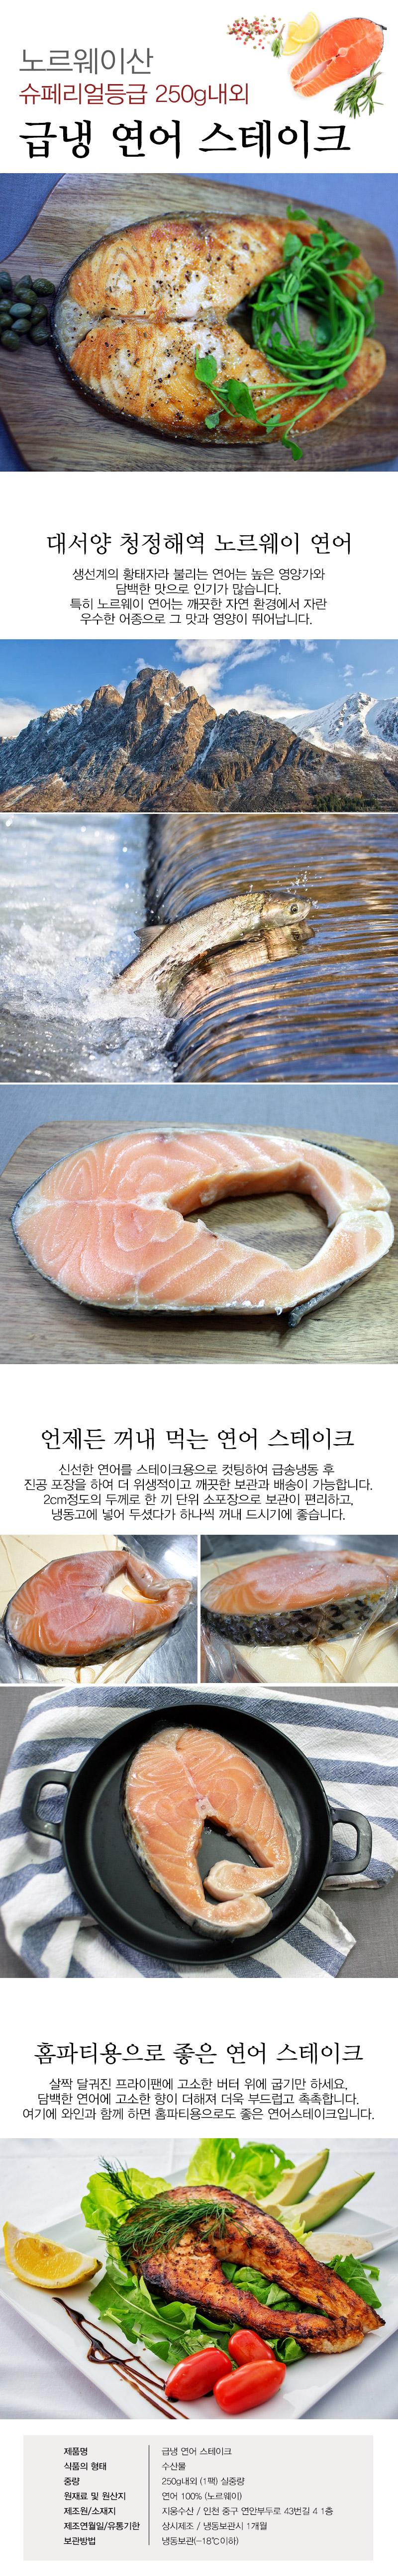 JW-salmon-250.jpg